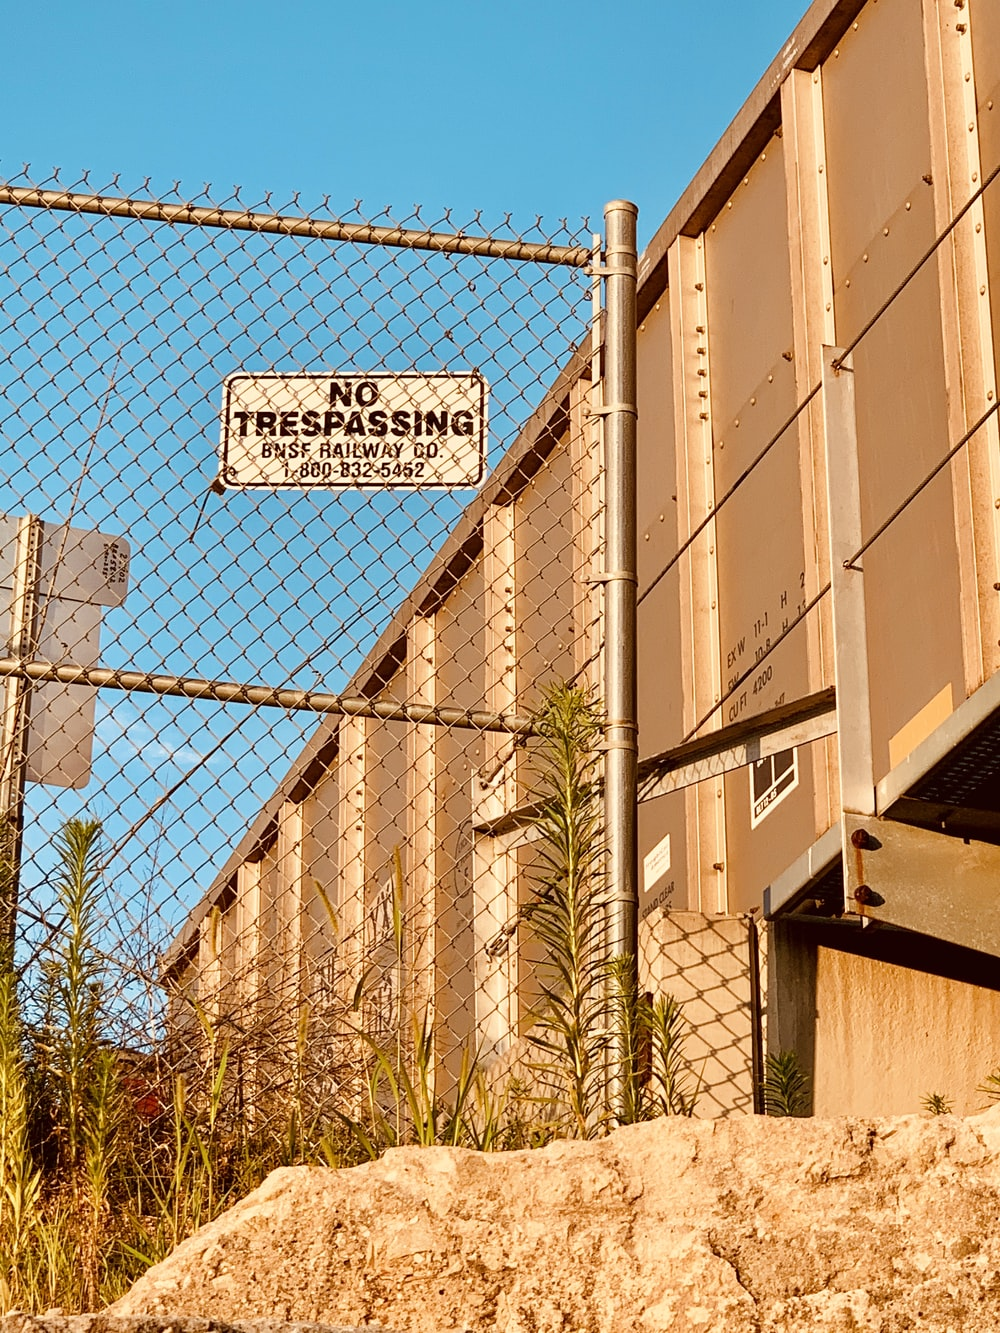 brown concrete building close-up photography